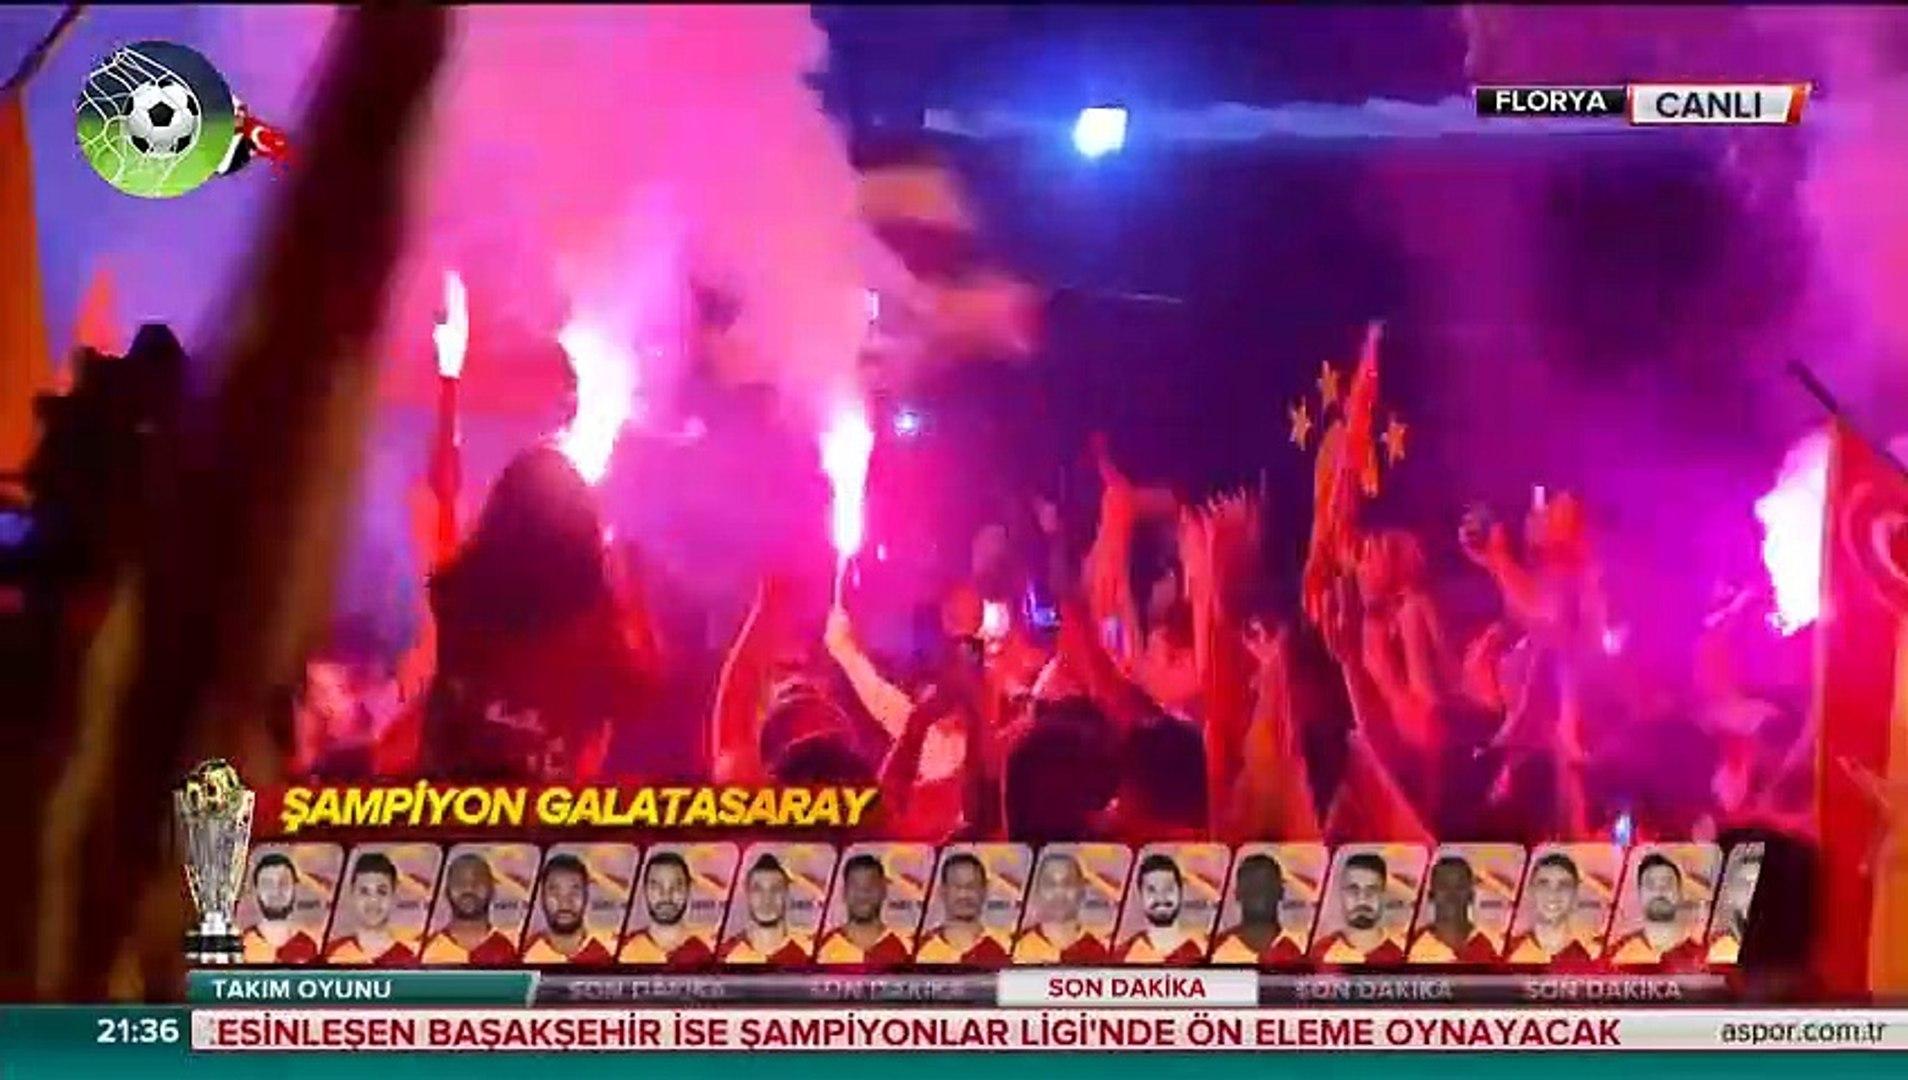 Galatasaray 2-1 Başakşehir  şampiyon GALATASARAY